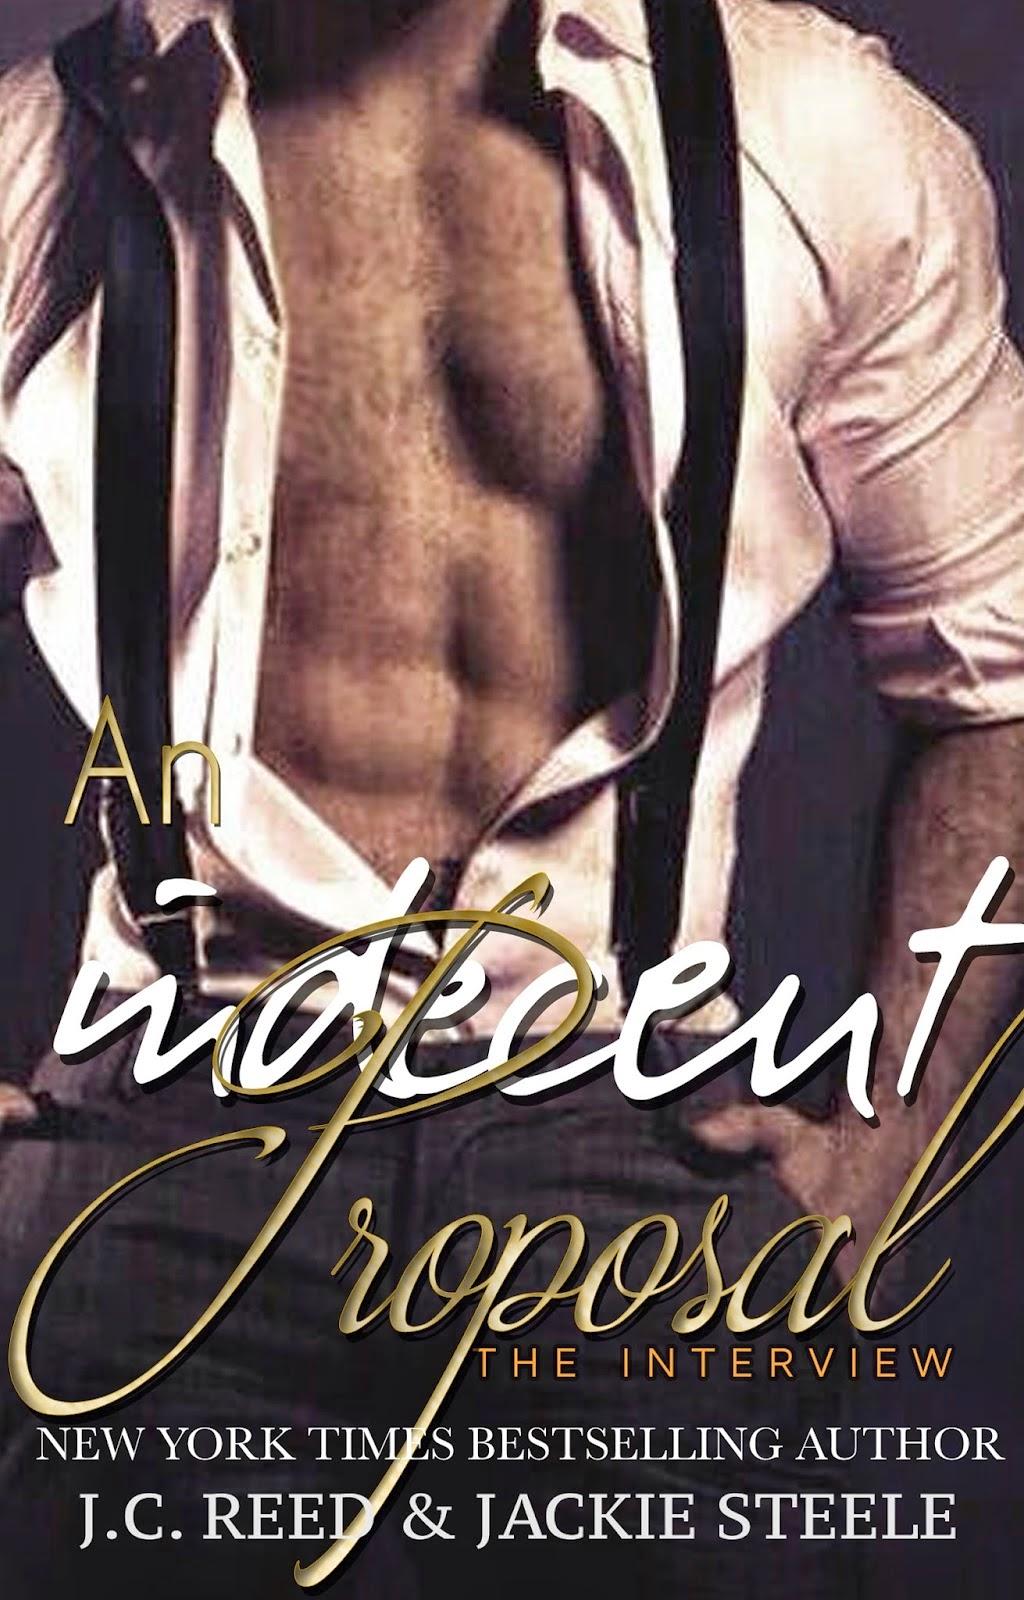 ebook erotica new release lady porn